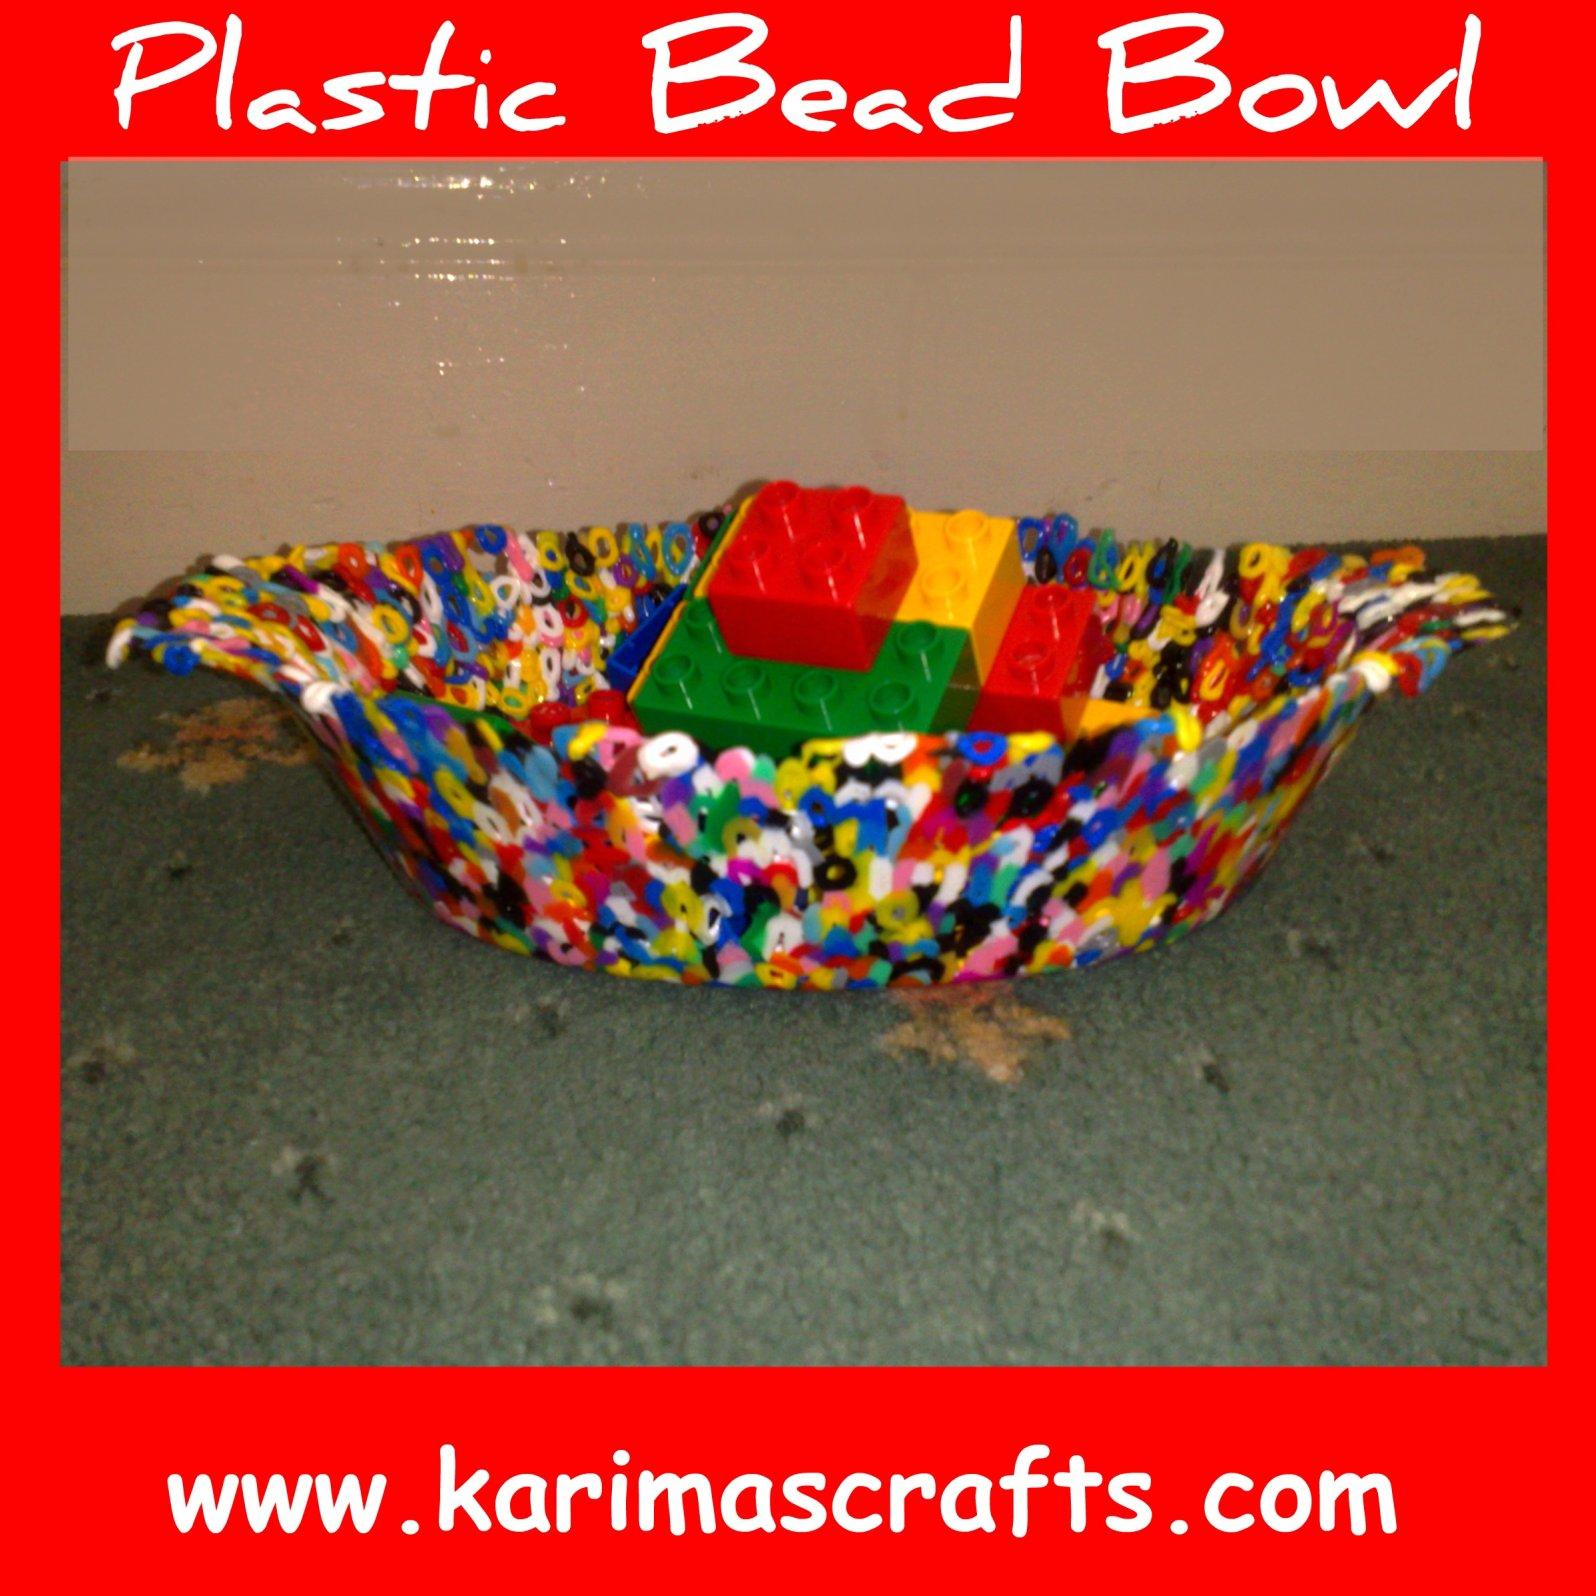 Plastic beads for crafts - Plastic Bead Bowl Tutorial